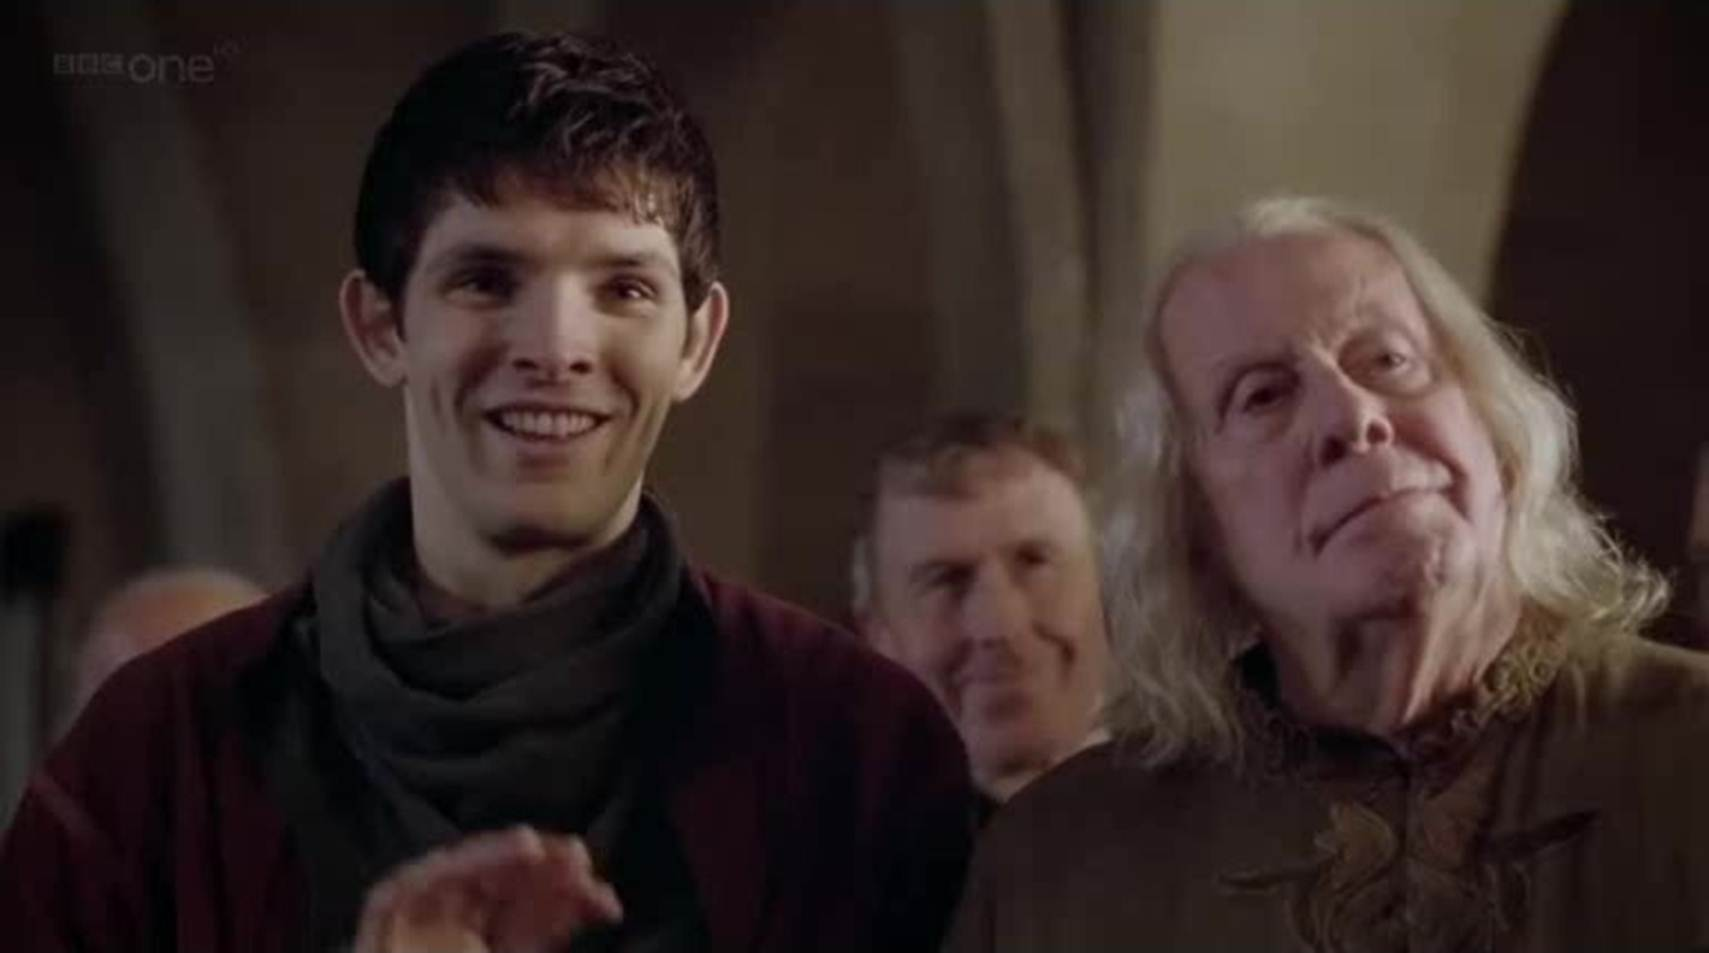 Merlin season 5 gaius : Regarder le film mr bean gratuitement